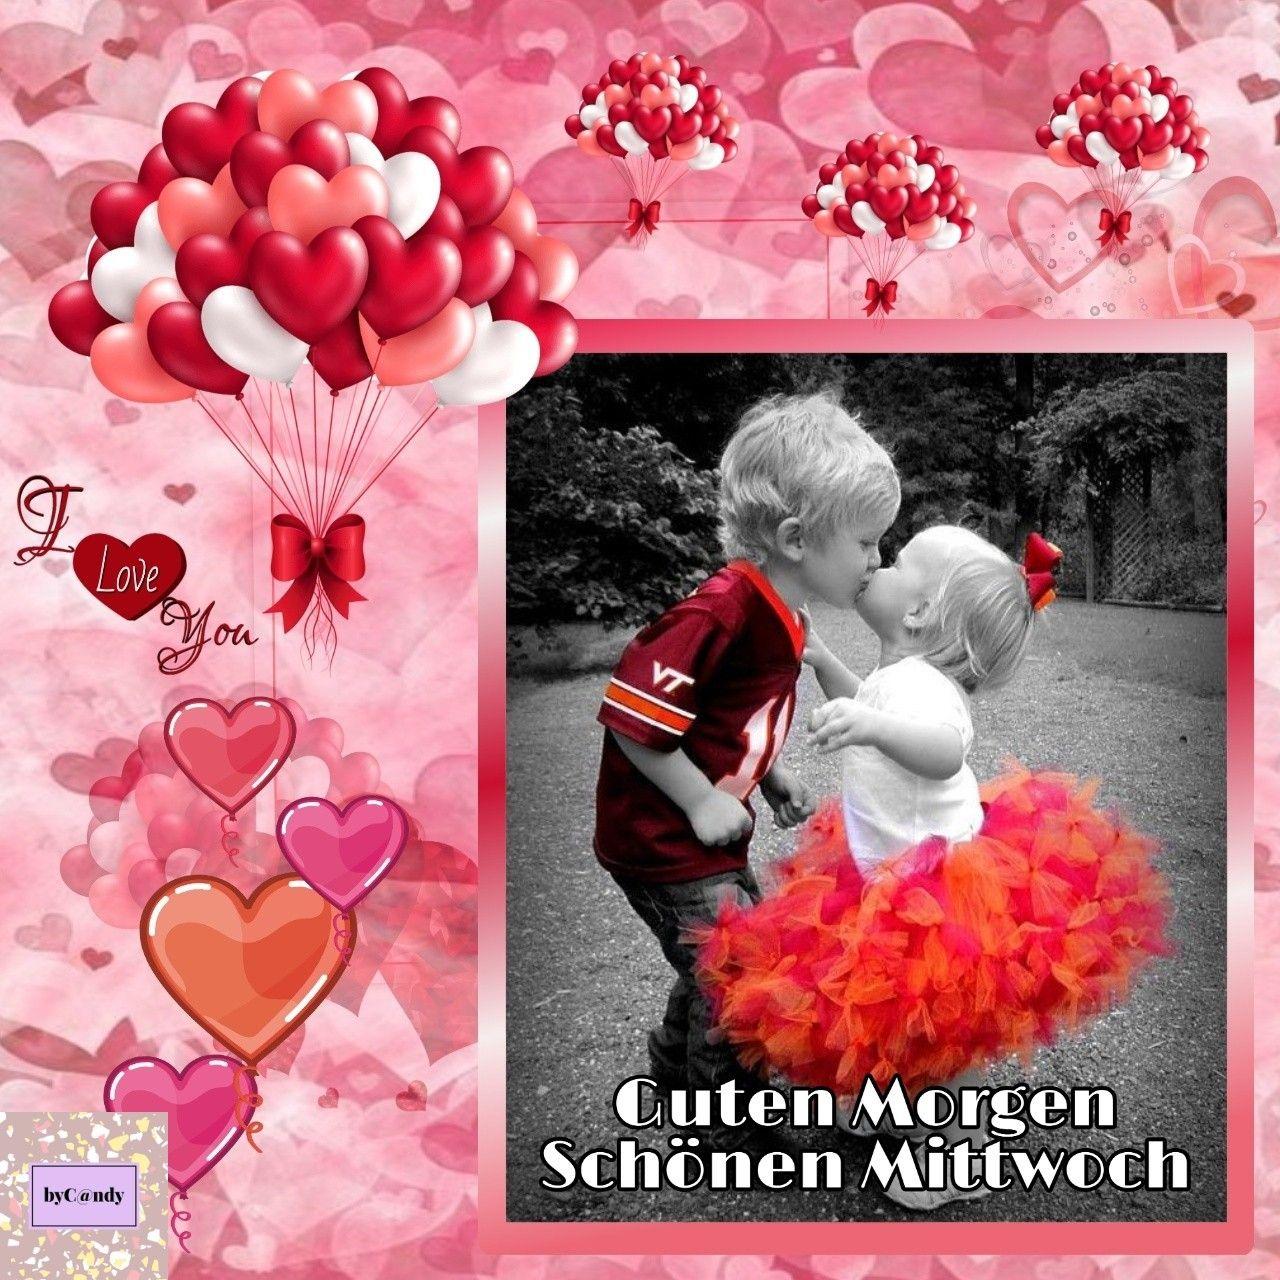 Pin von yvonne2901 auf Greetings / Grüße   Liebe grüße